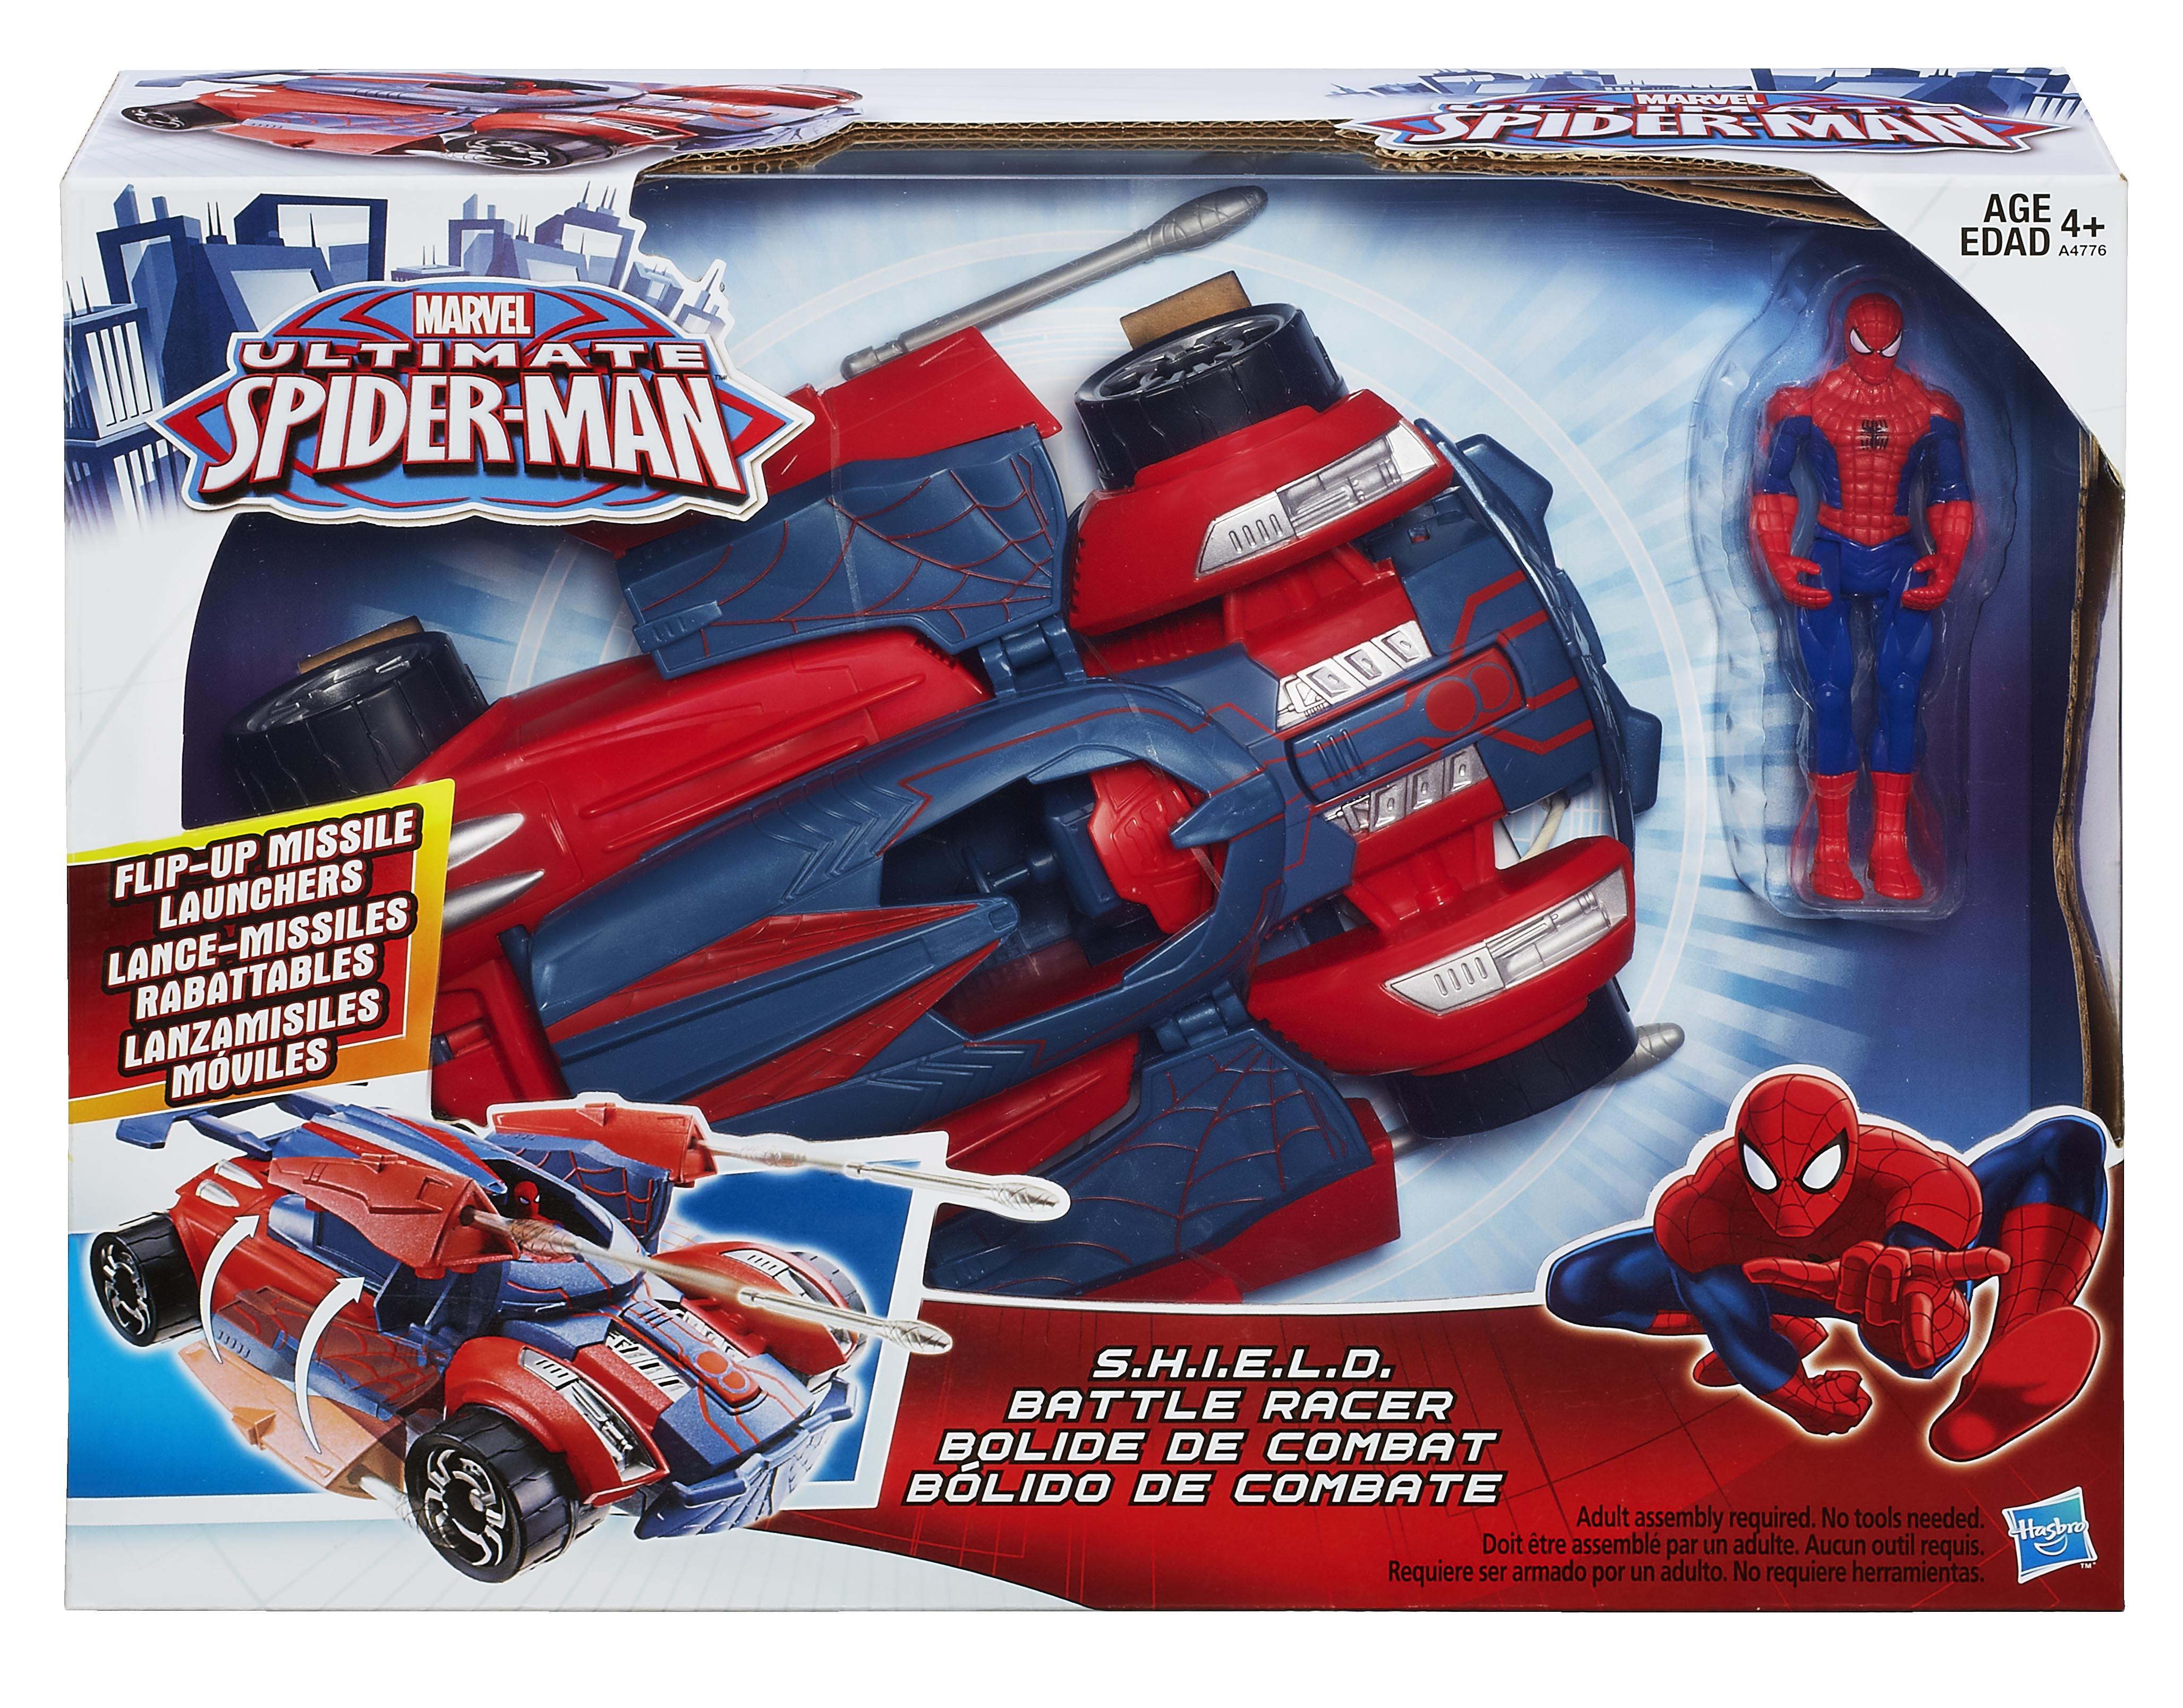 La macchina fotografica firmata SPIDER-MAN - Le Shopping News